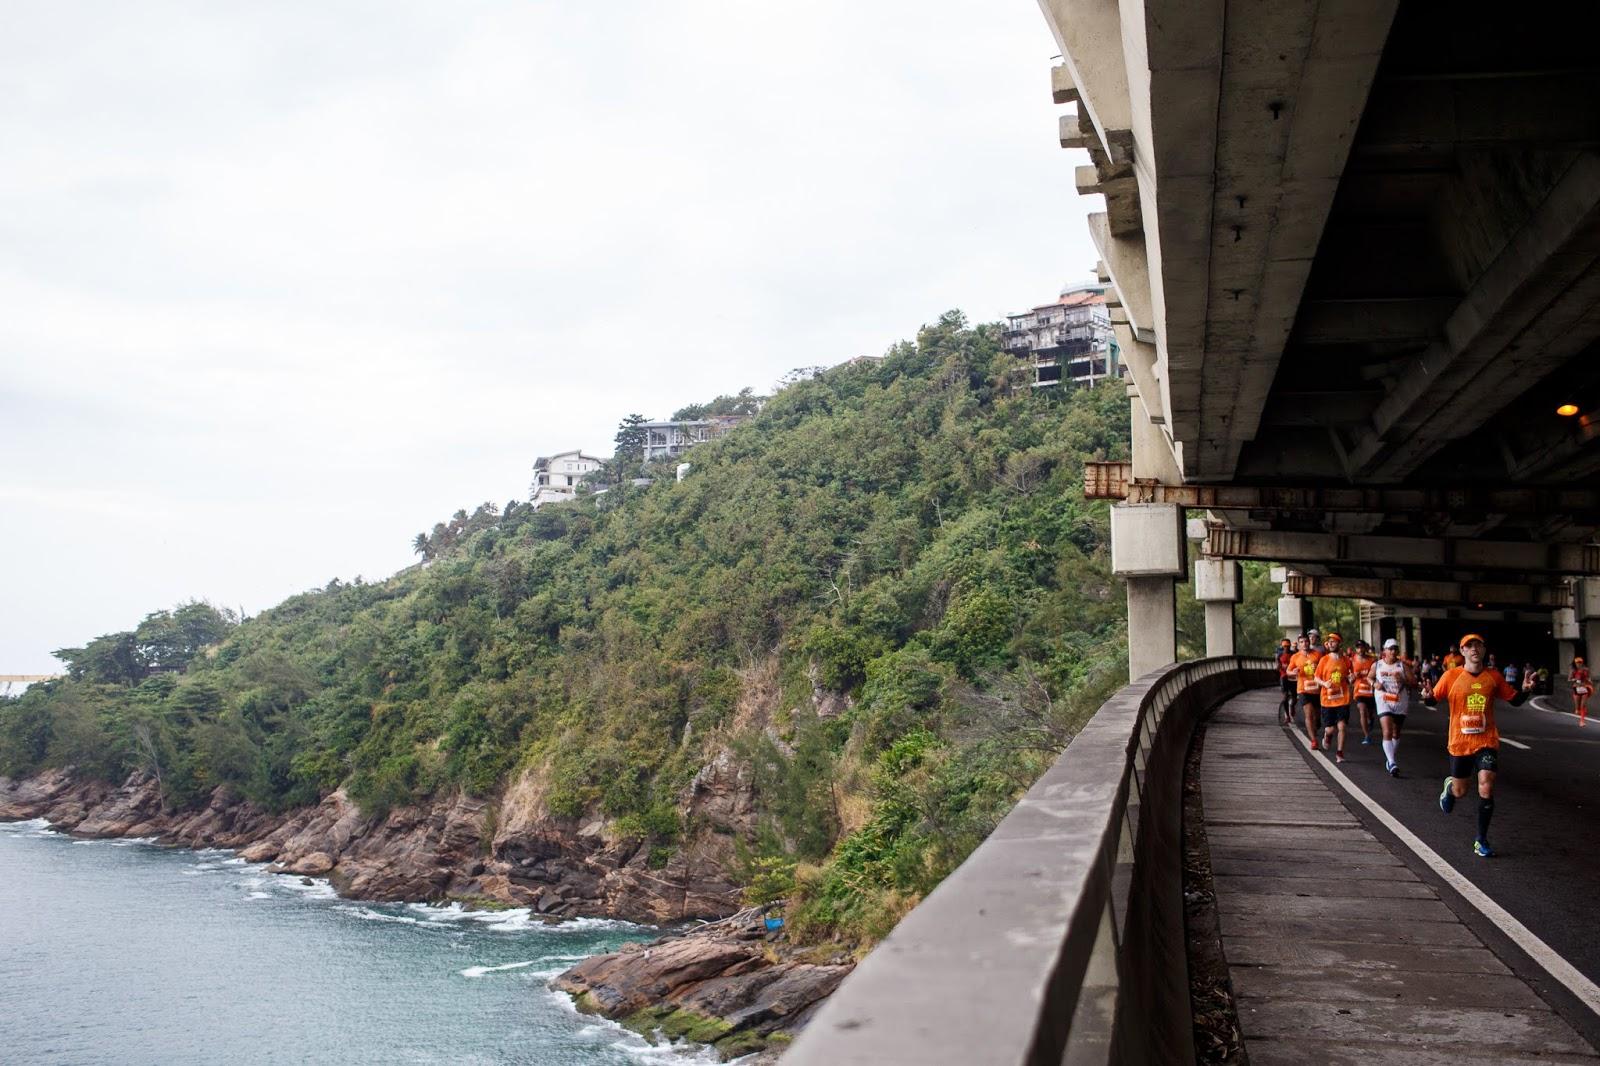 9e6beabd4b7 Mania de Corrida  Maratona do Rio e Desafio Cidade Maravilhosa  a ...